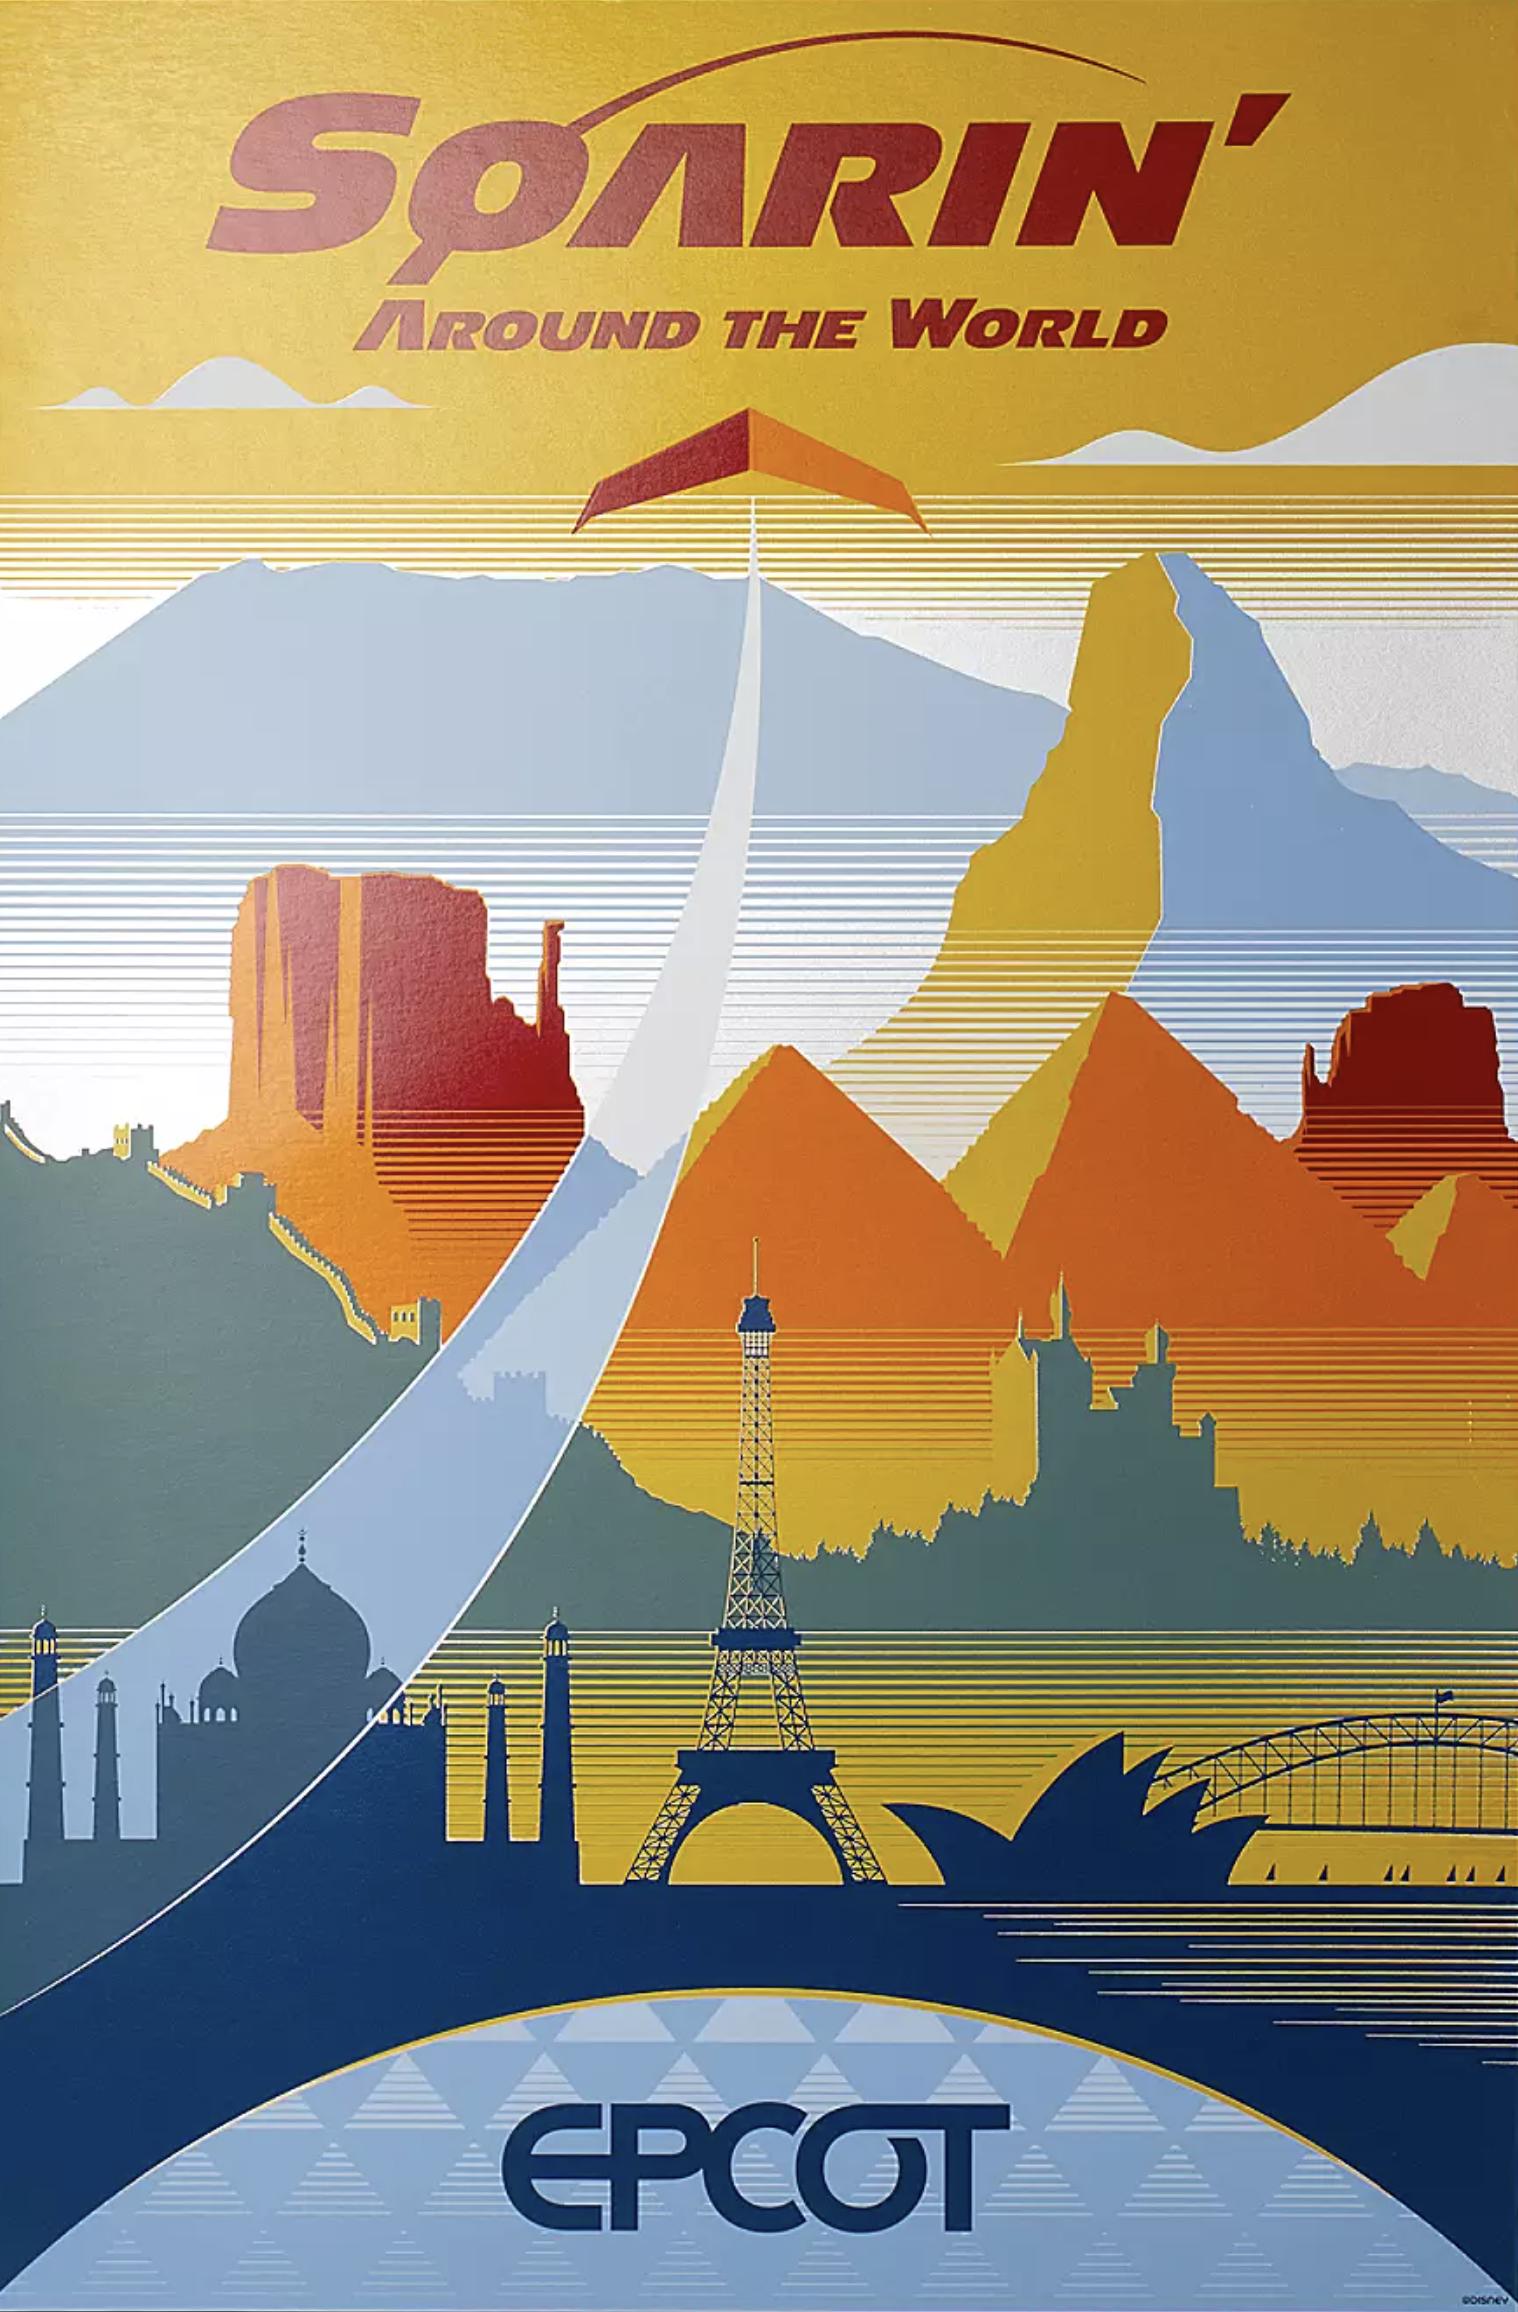 Soarin Around the World Poster